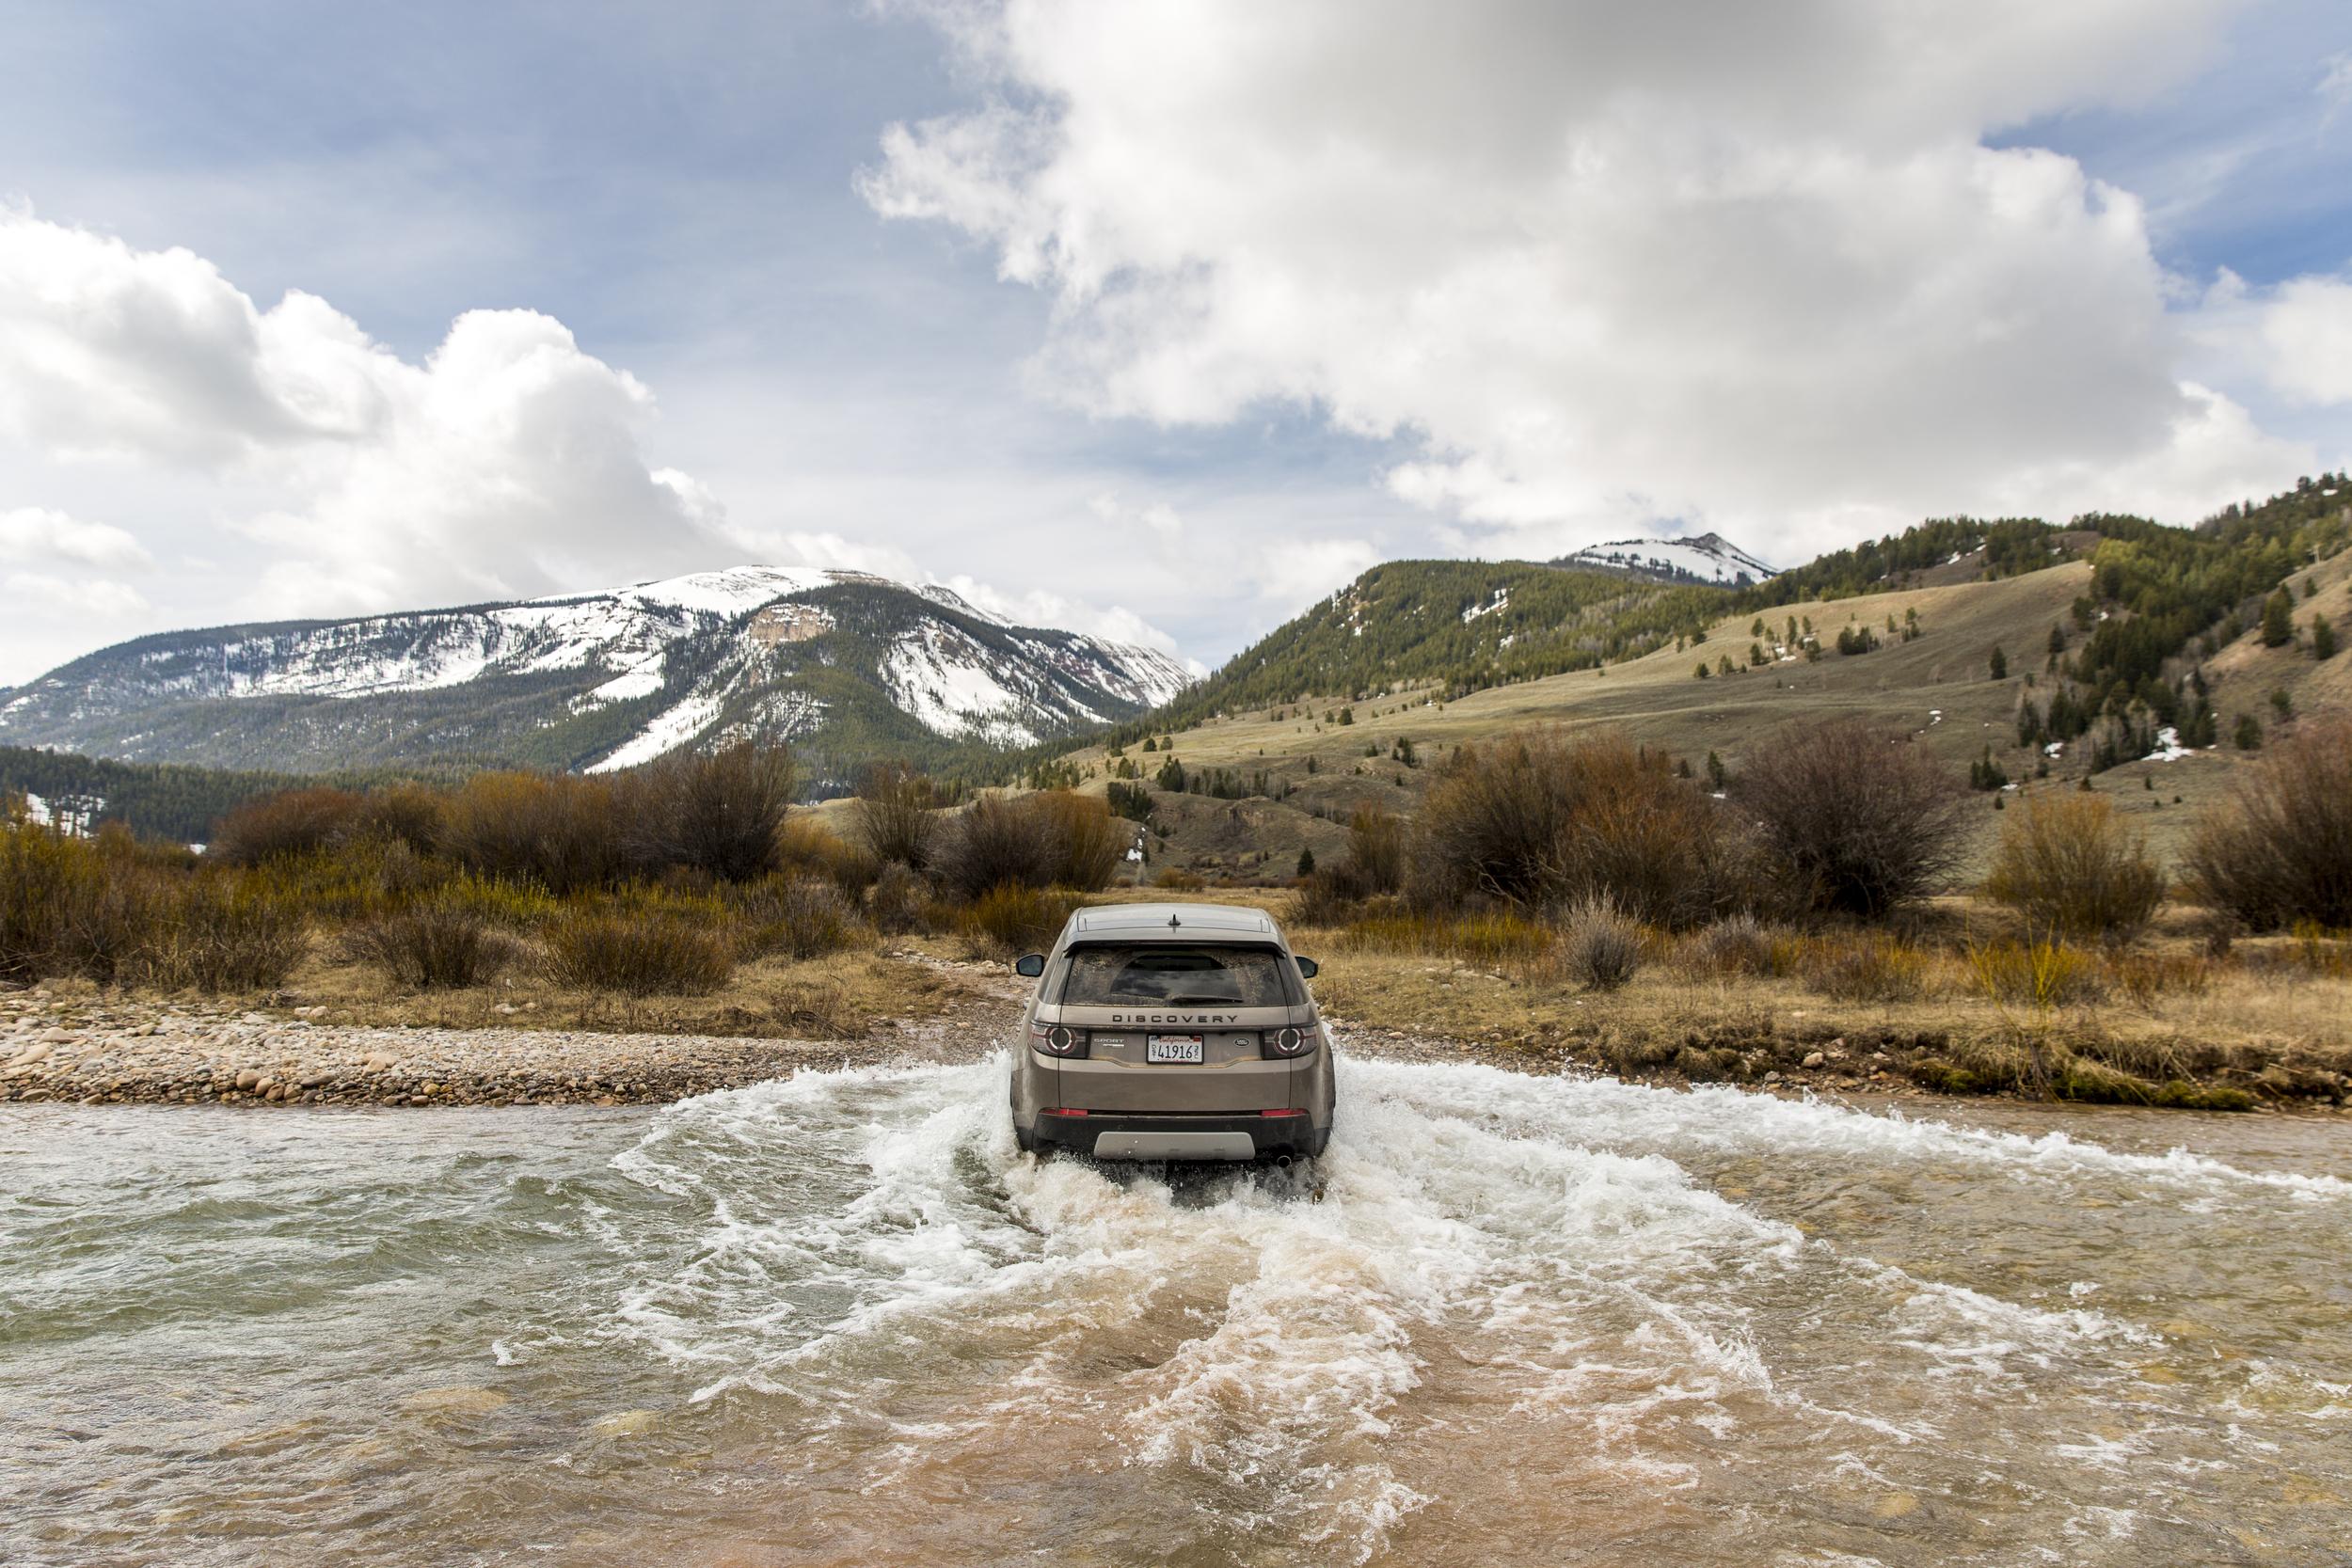 15_4 Land Rover MO_Final_Selects-60.jpg